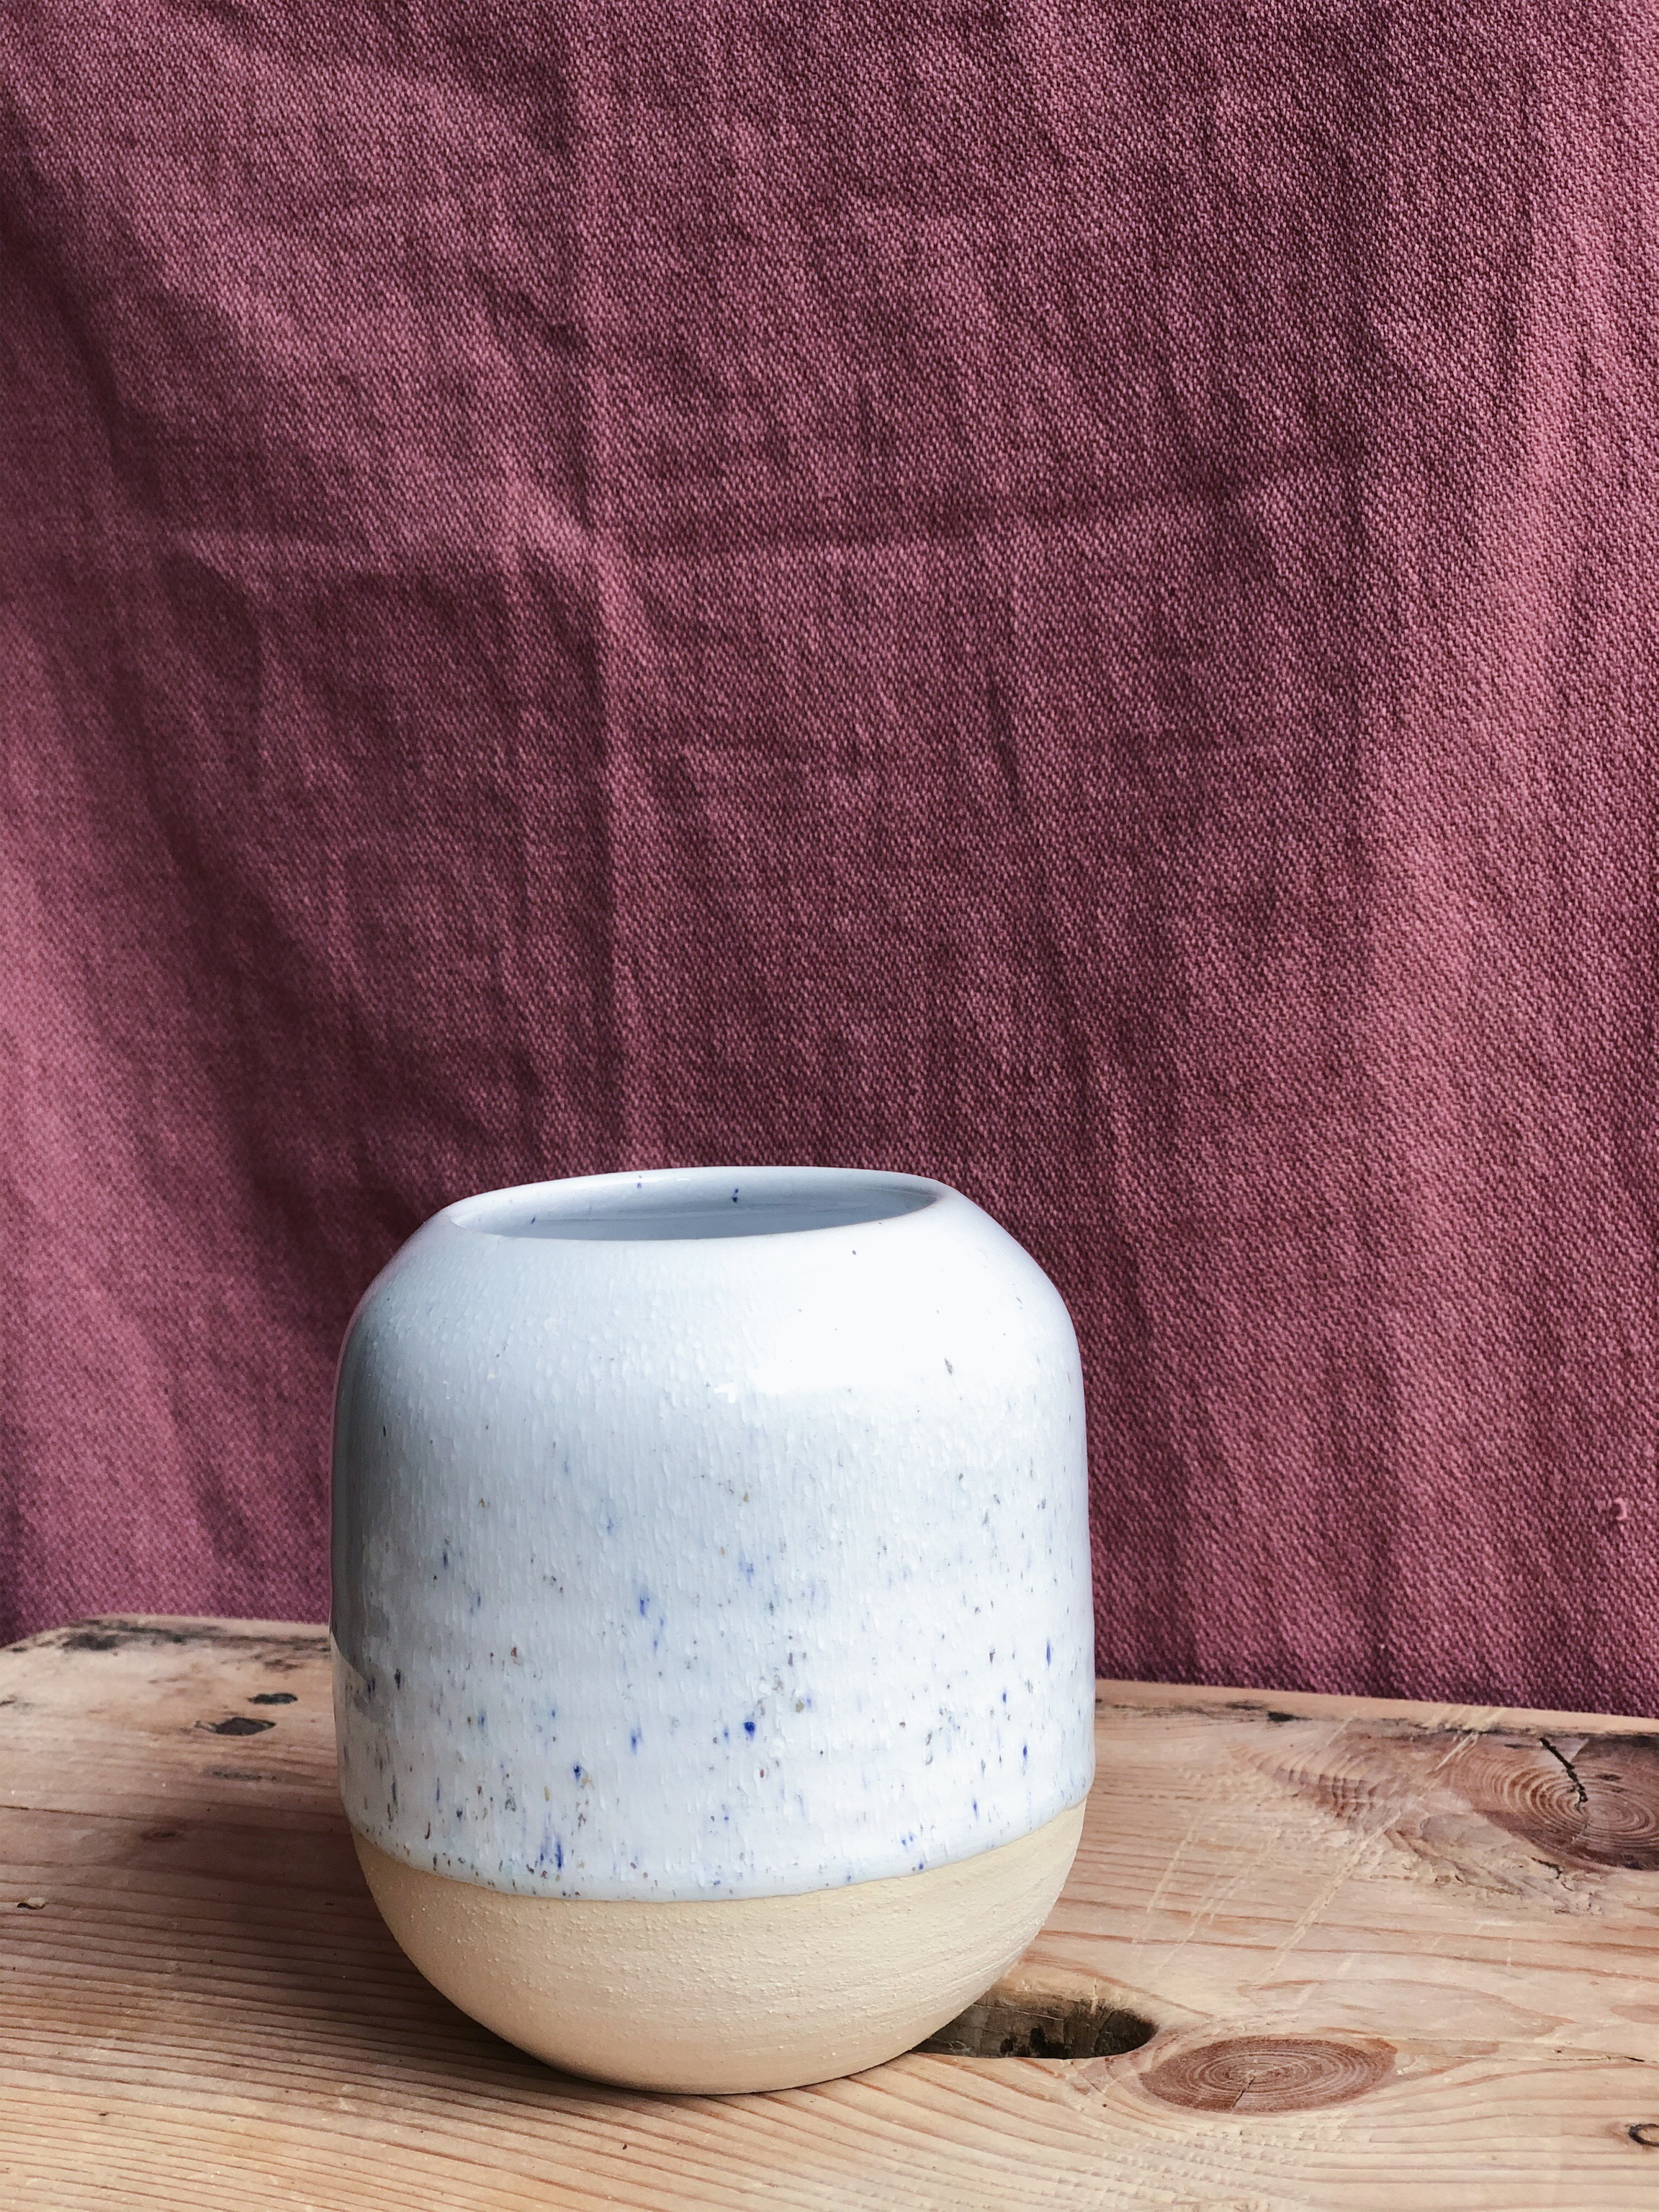 STUDIO ARHØJ - Pen Cup, Crystalline Cream